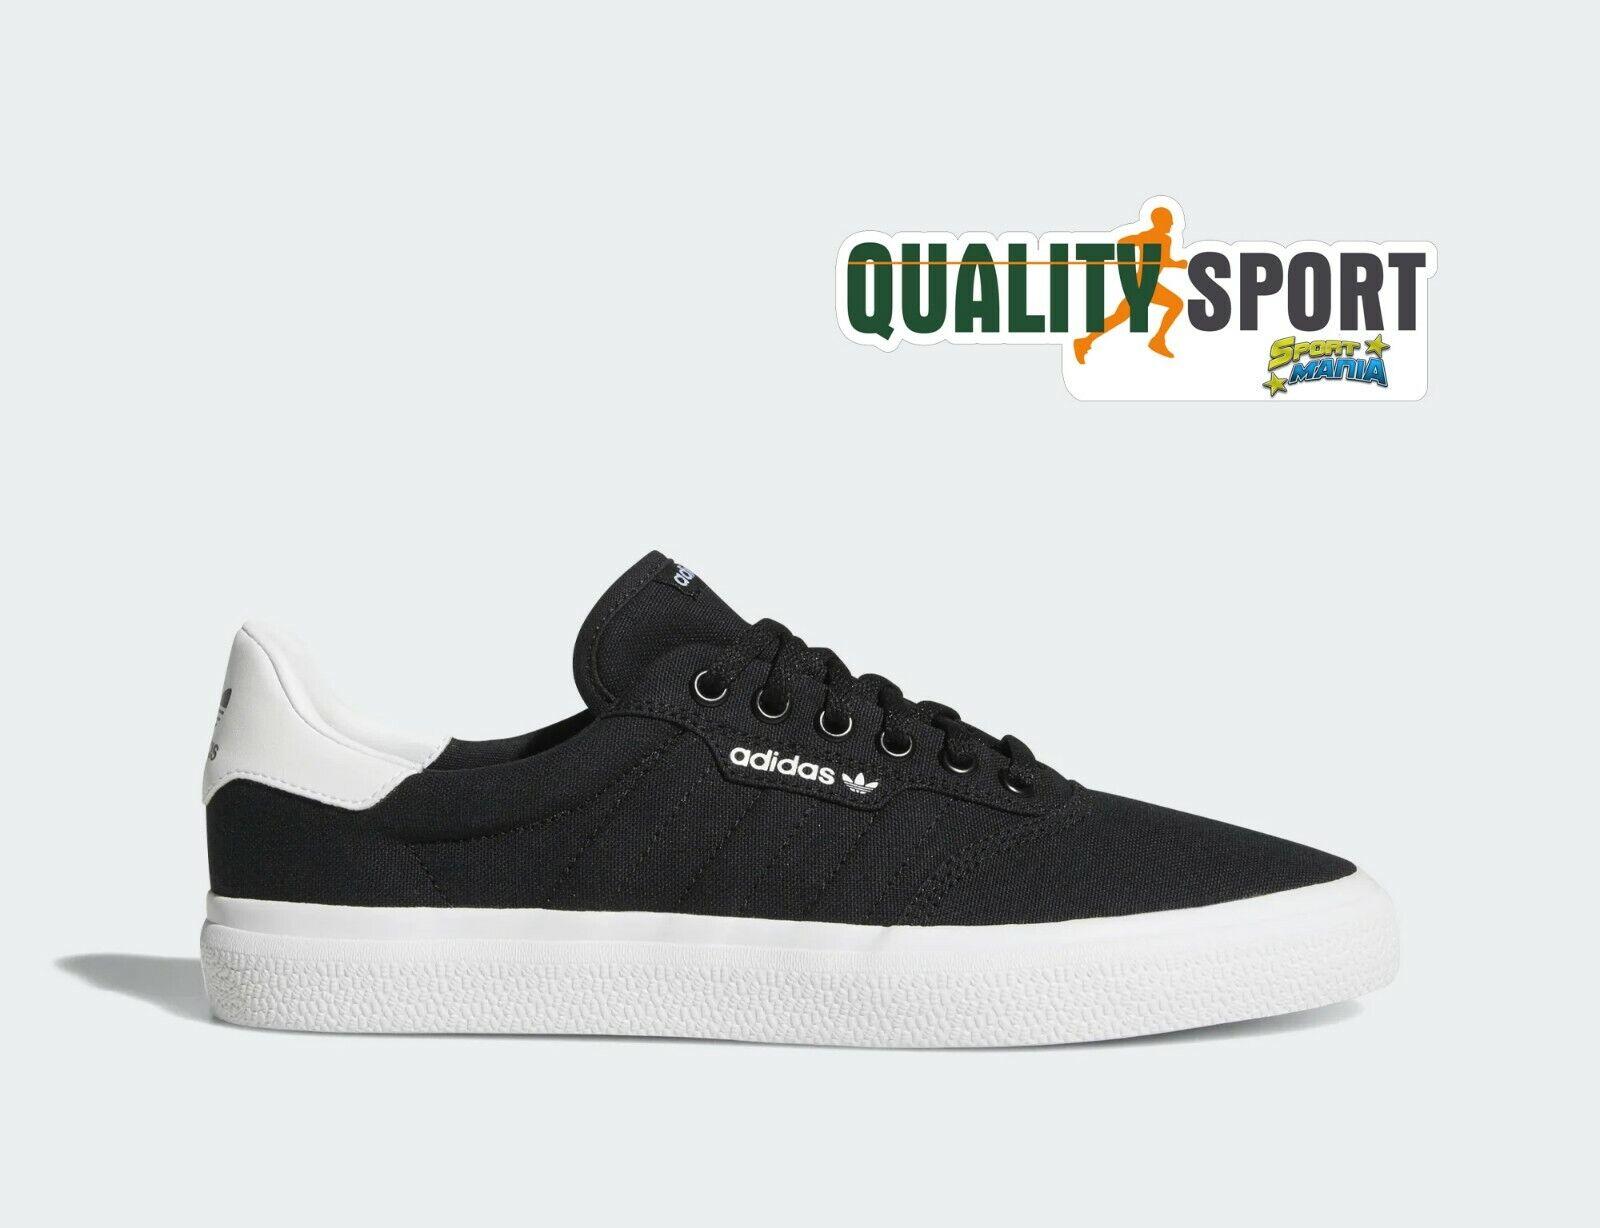 Adidas 3MC black Canvas Tela shoes shoes men Sportive Sneakers B22706 2019